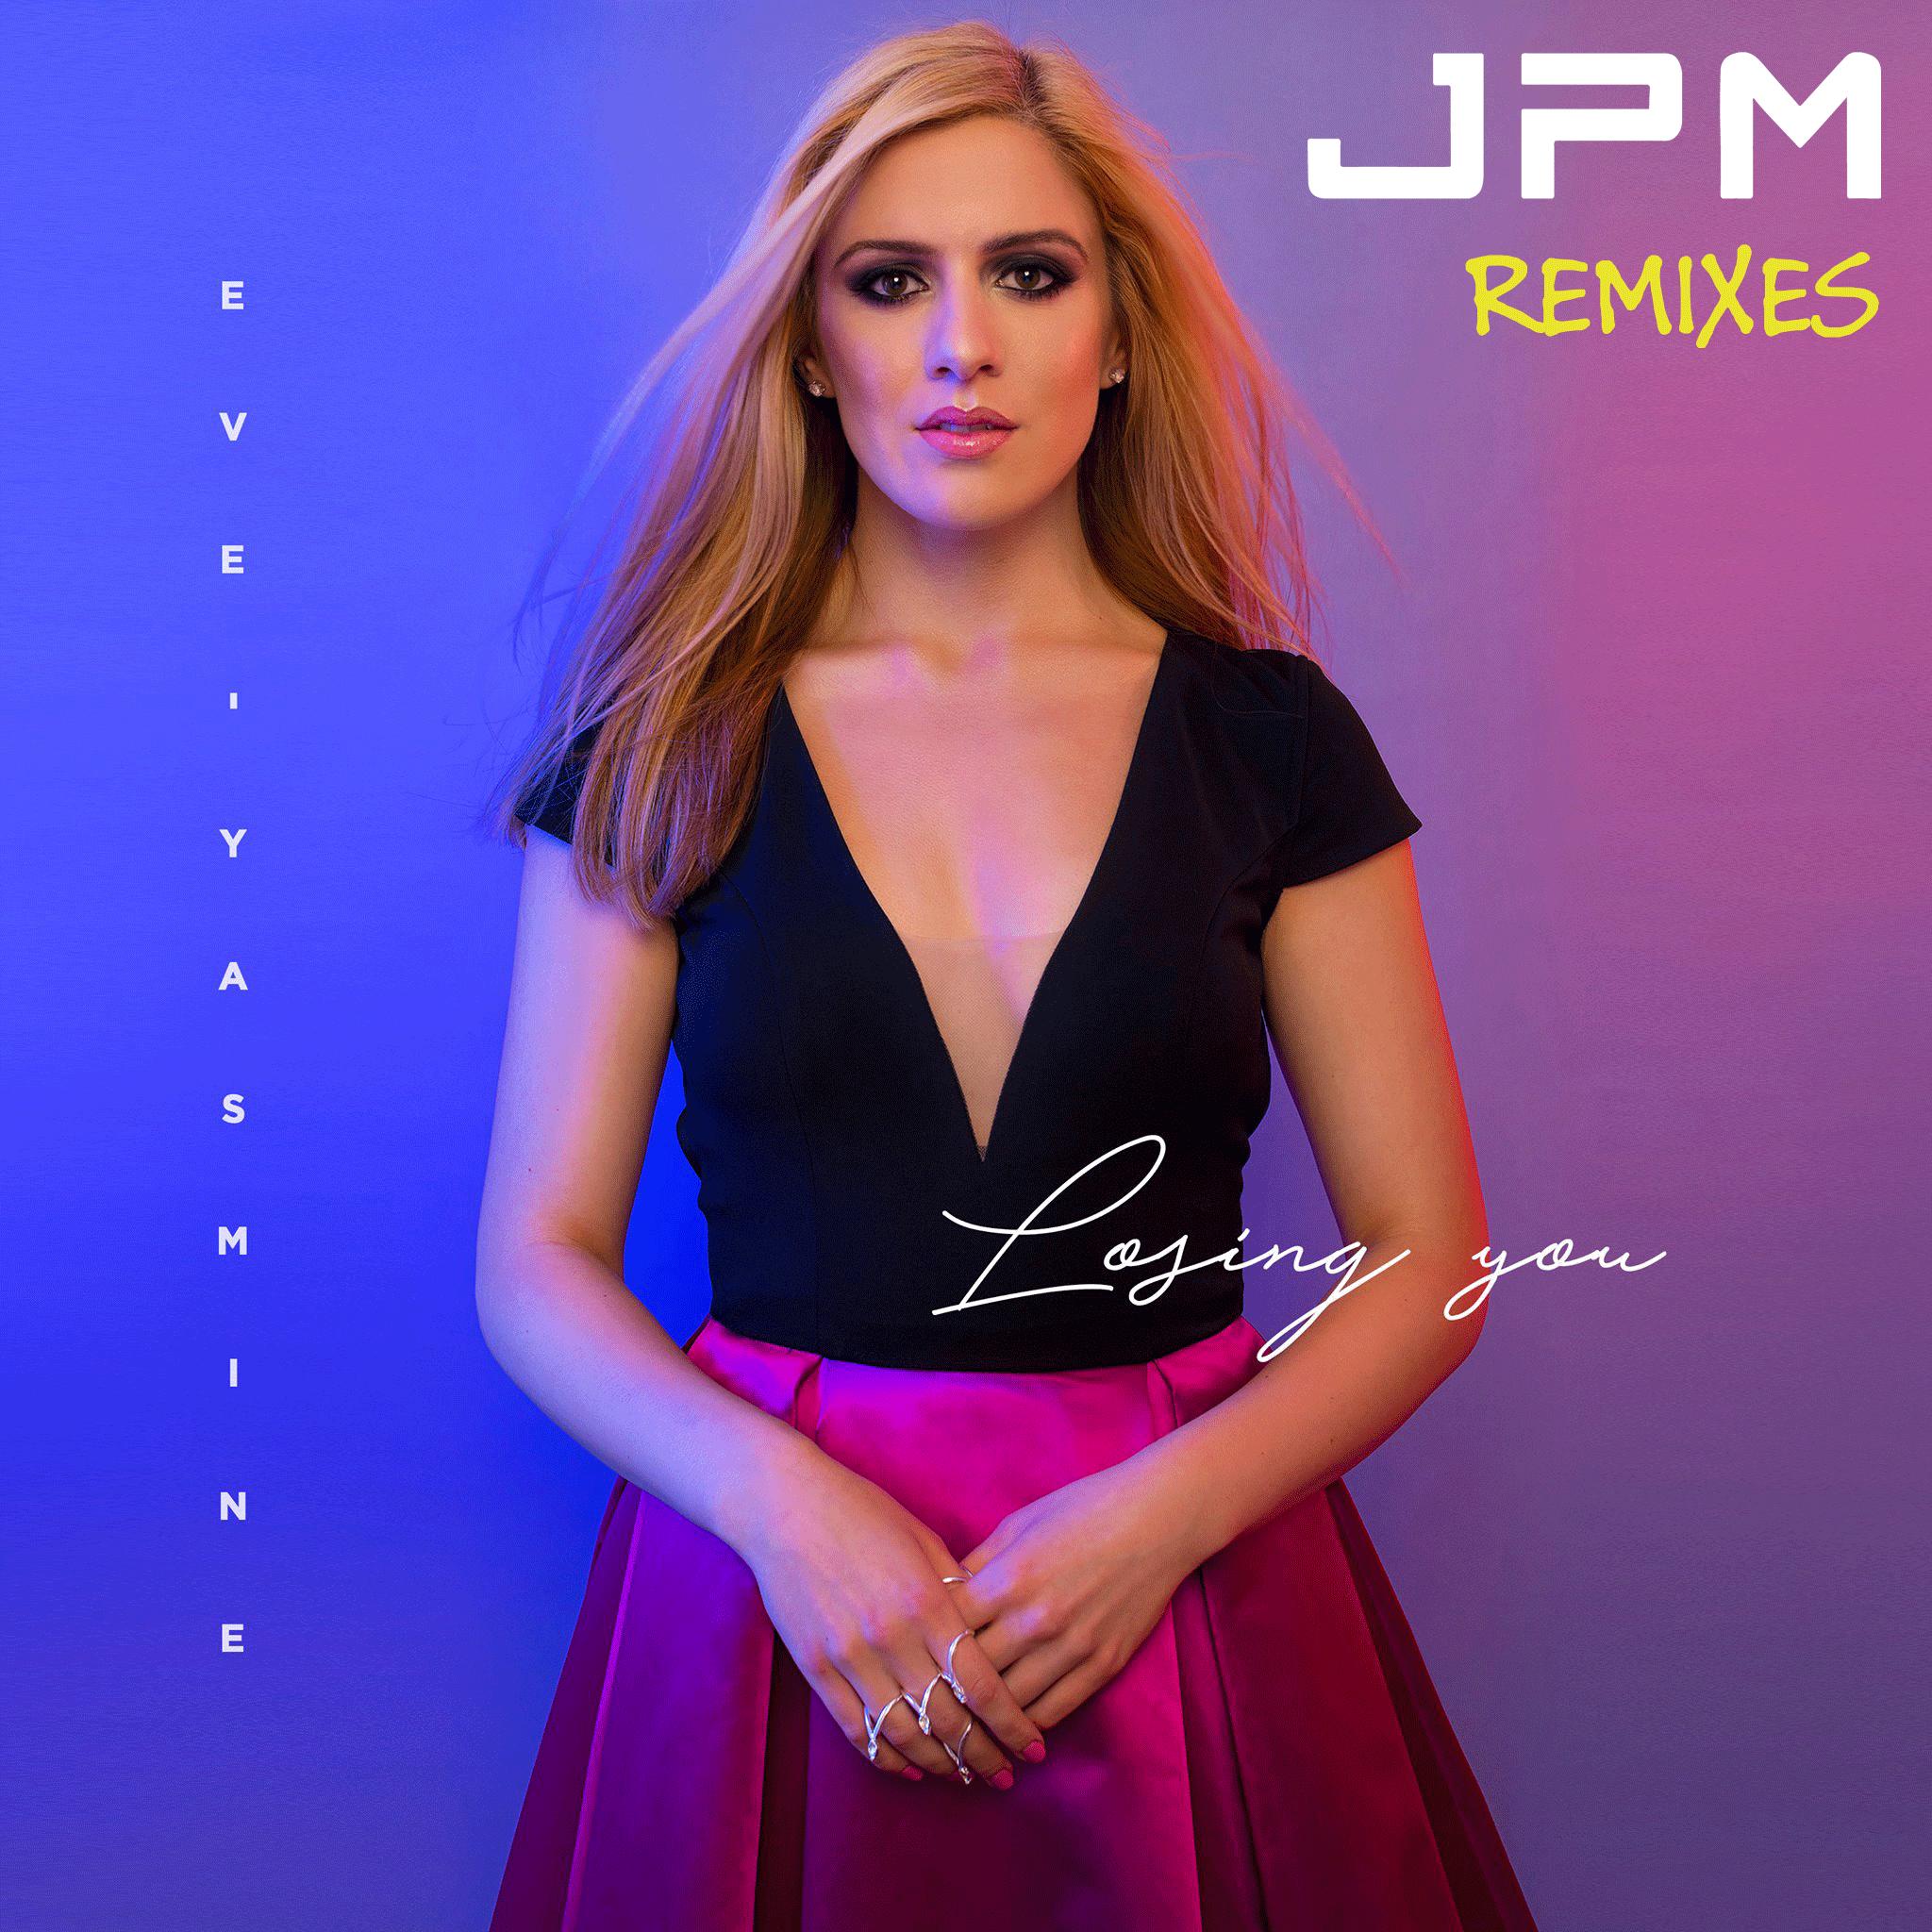 Eve-Yasmine 'Losing You' JPM Remixes